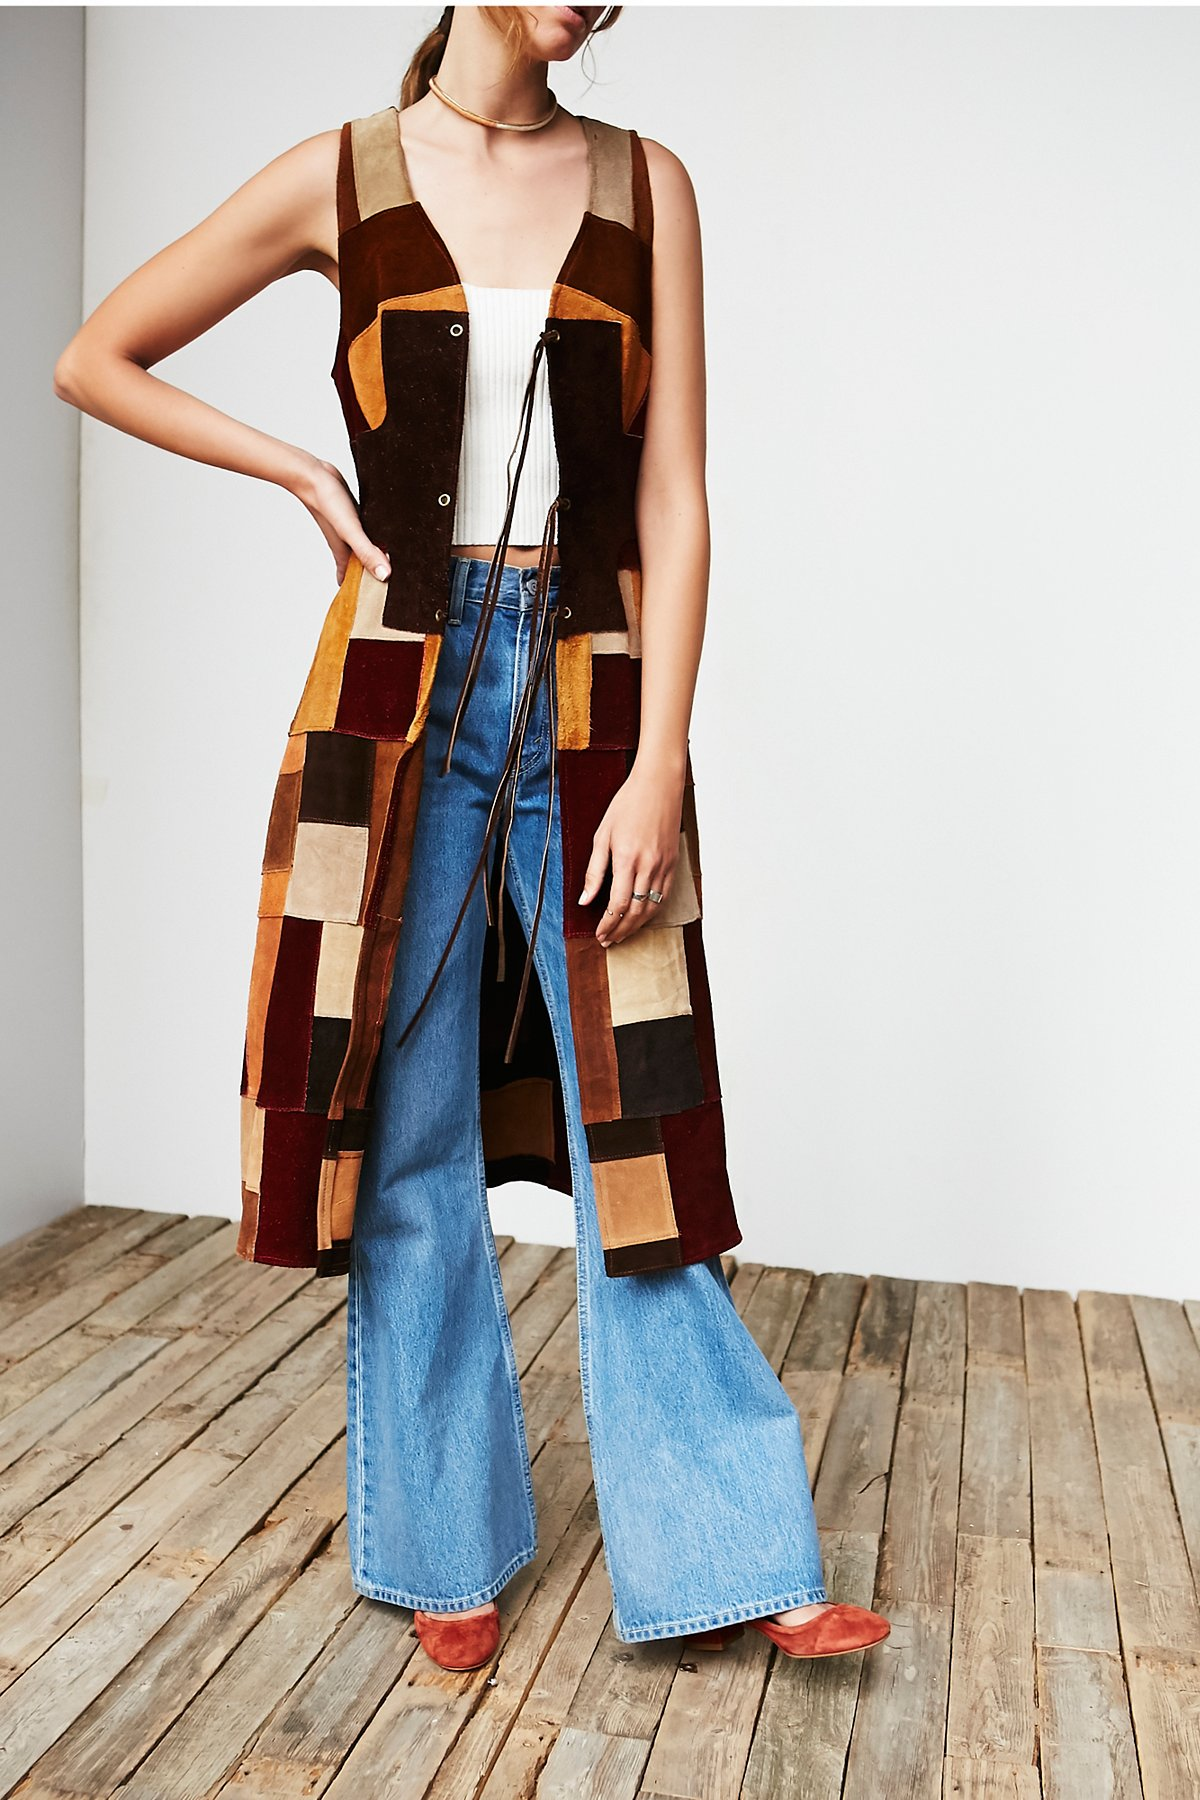 Vintage '70s Suede Patchwork Dress